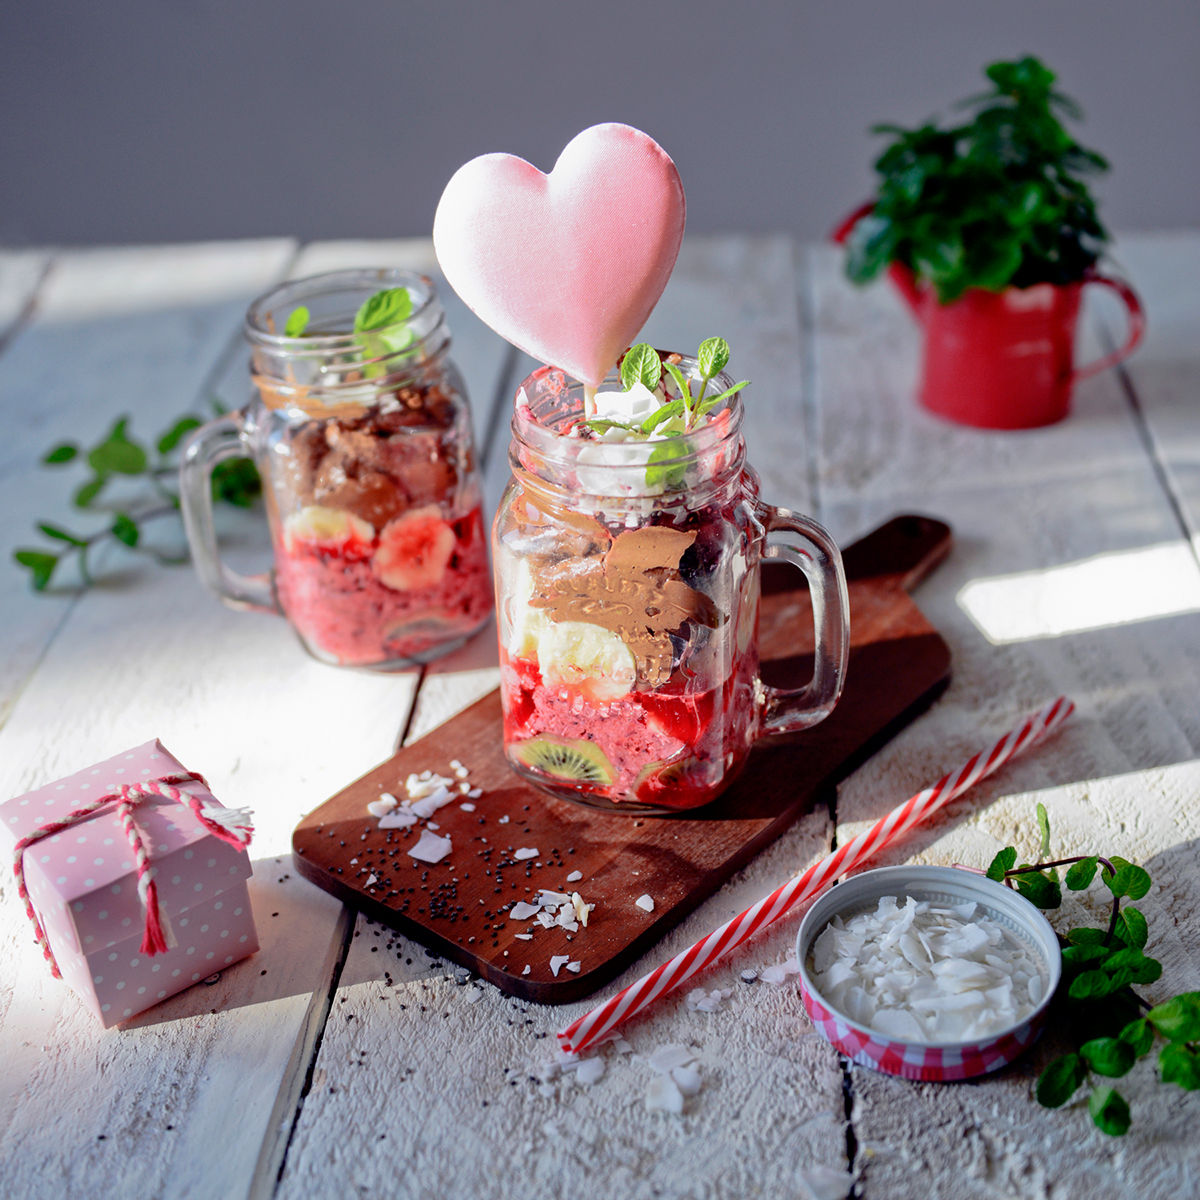 Valentine's Day valentine heart Love dessert strawberry avocado mint sweet treats Culinary food design